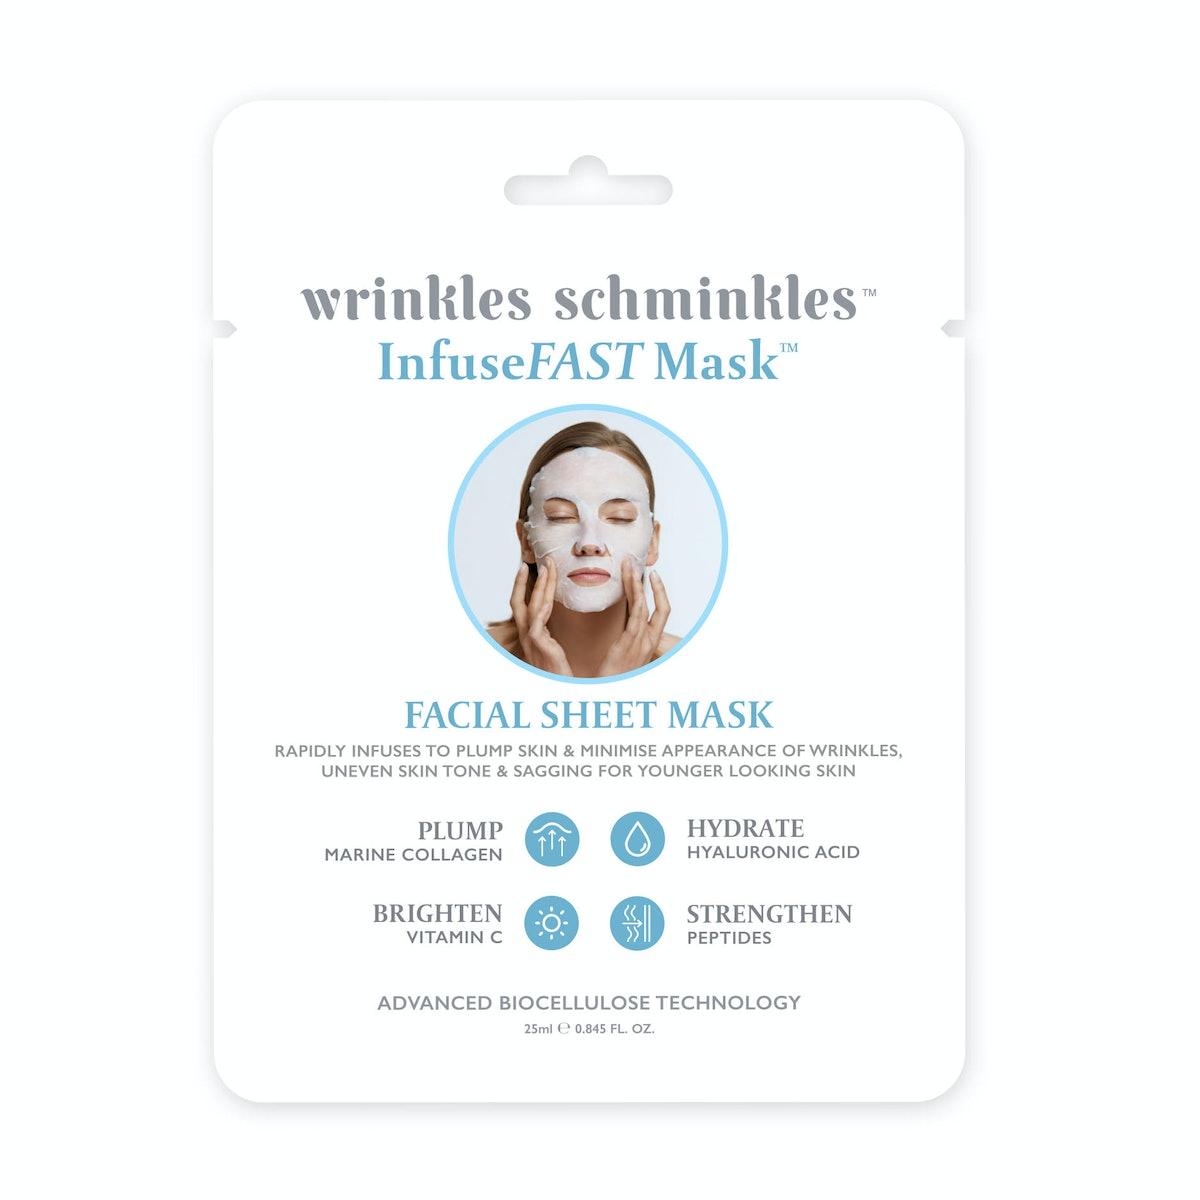 InfuseFAST Facial Sheet Mask